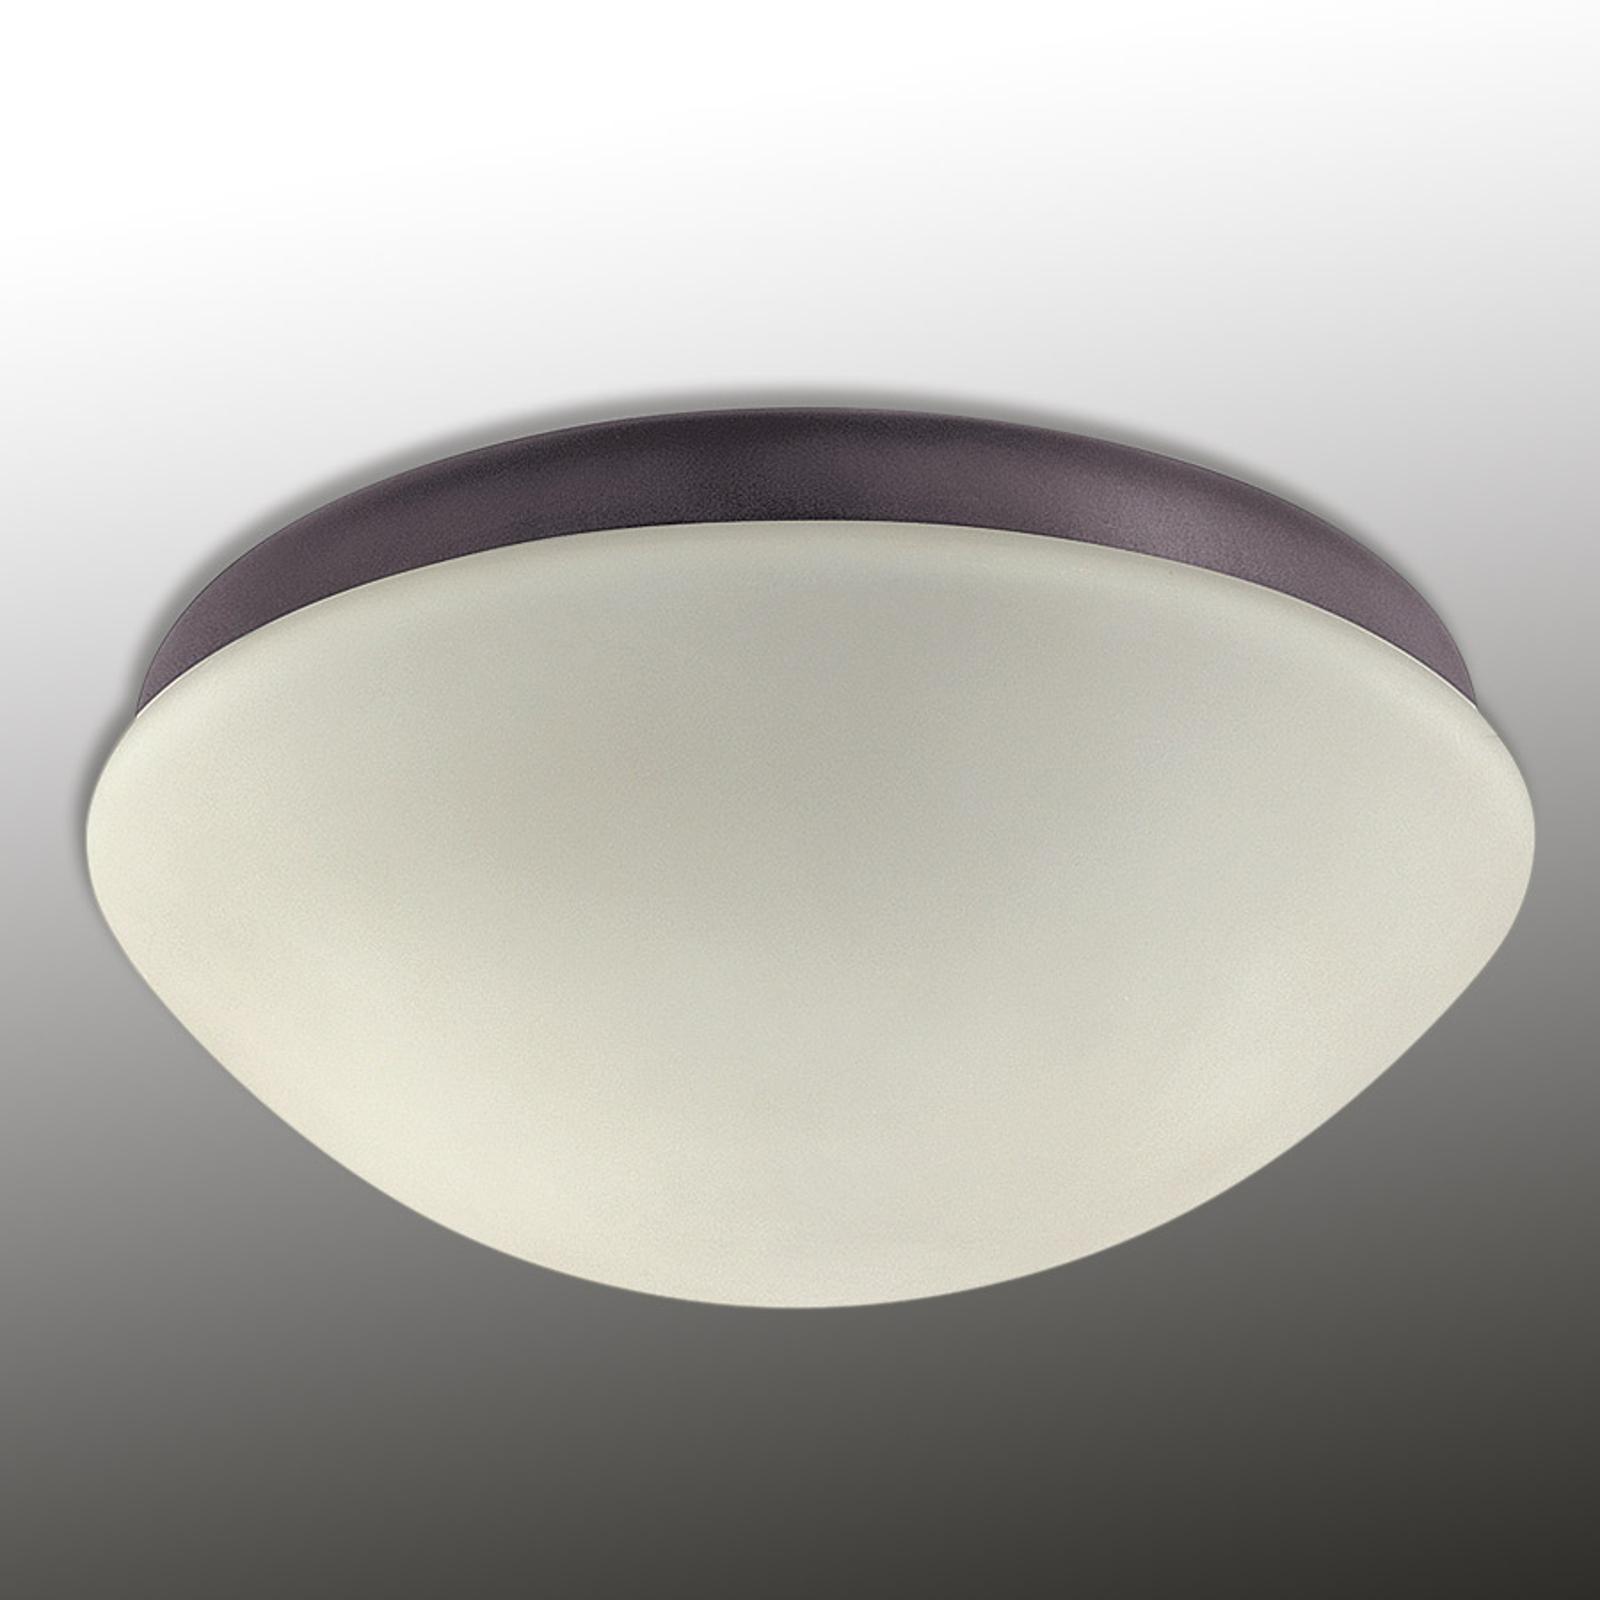 Svietidlo pre stropný ventilátor Elements, biele_2015086_1